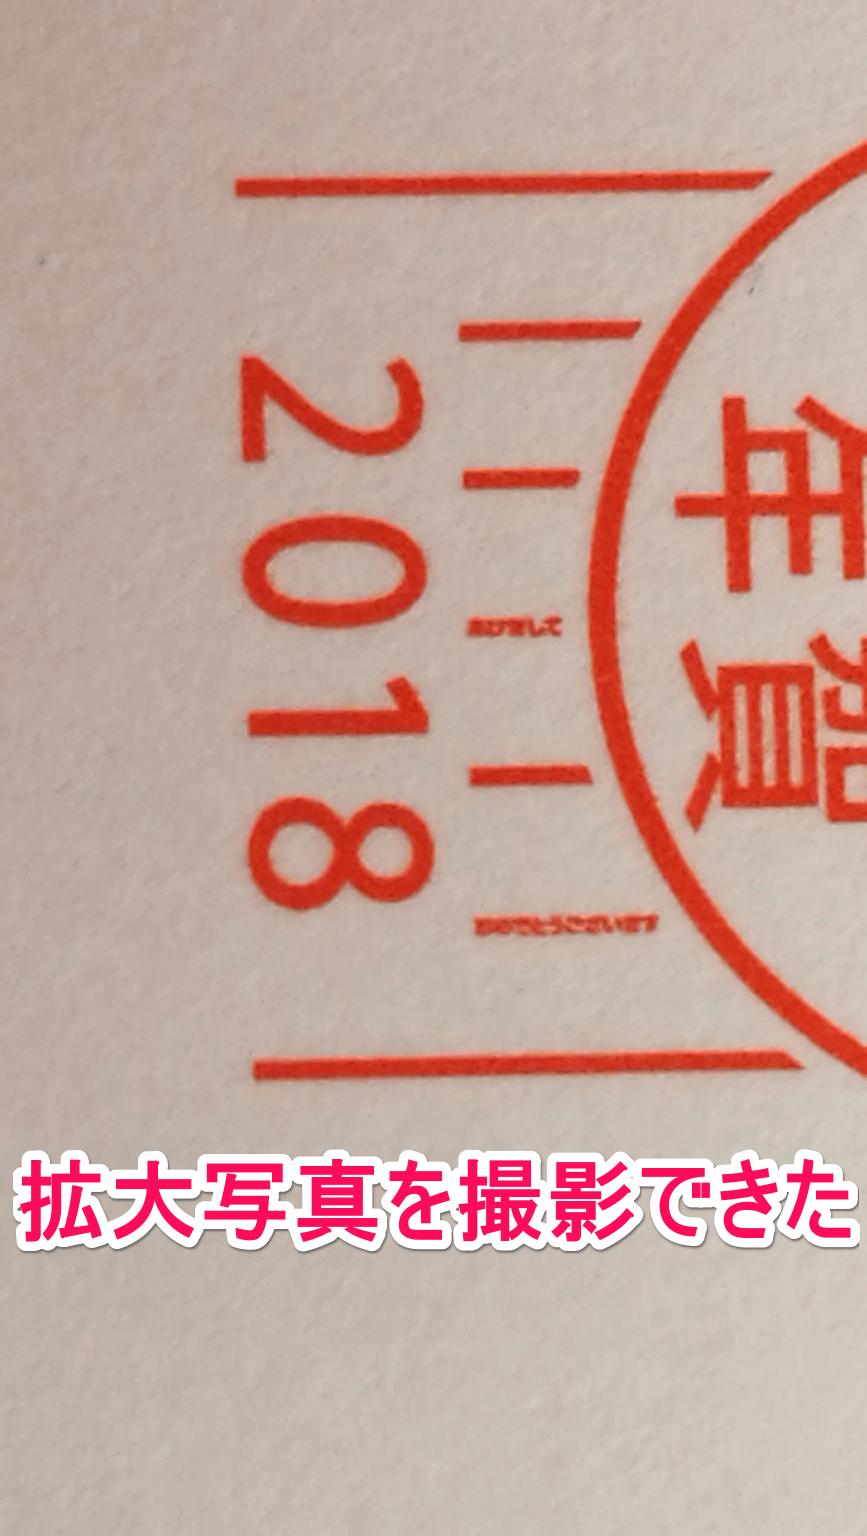 Android(アンドロイド)版「拡大鏡&顕微鏡(ルーペ)」アプリで撮影した年賀状の隠し印刷